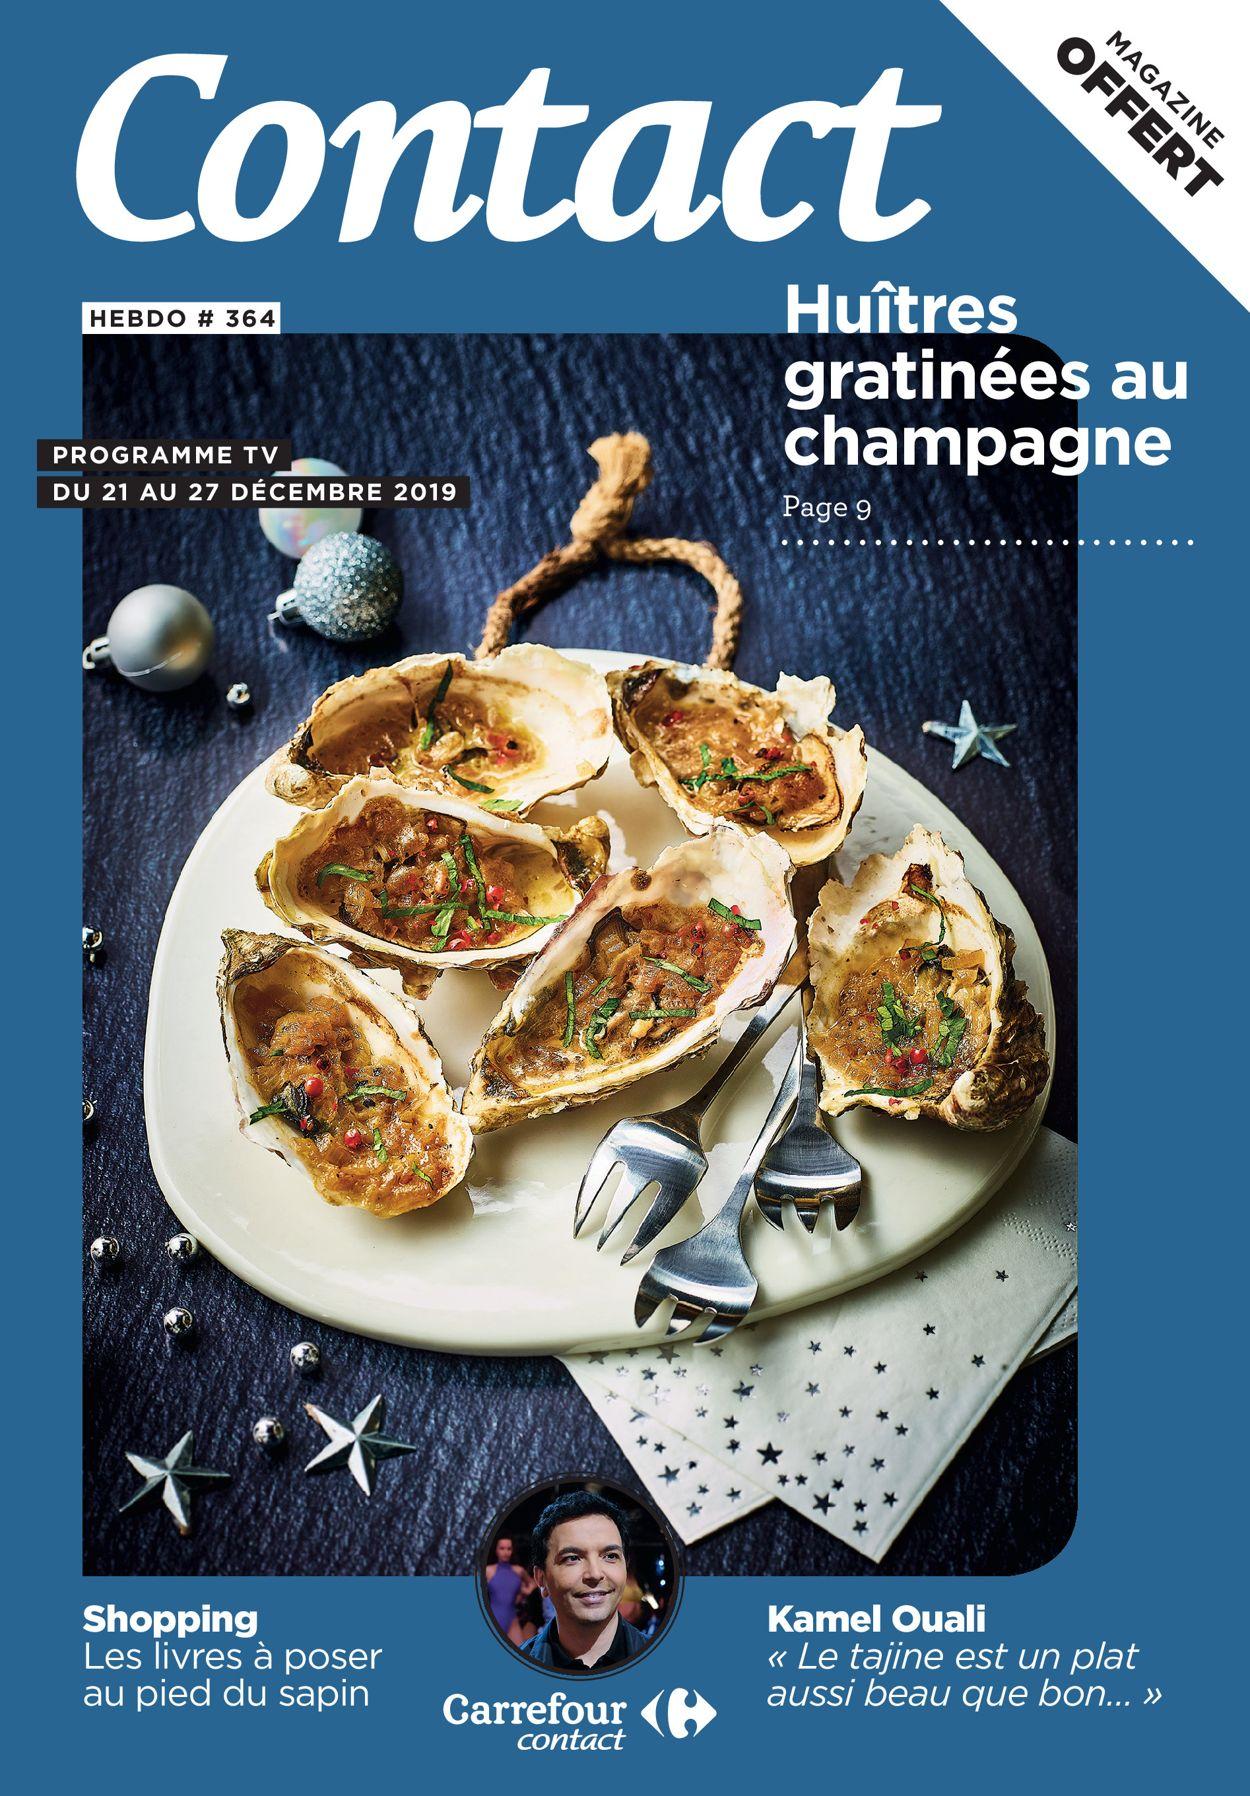 Carrefour - catalogue de Noël 2019 Catalogue - 21.12-27.12.2019